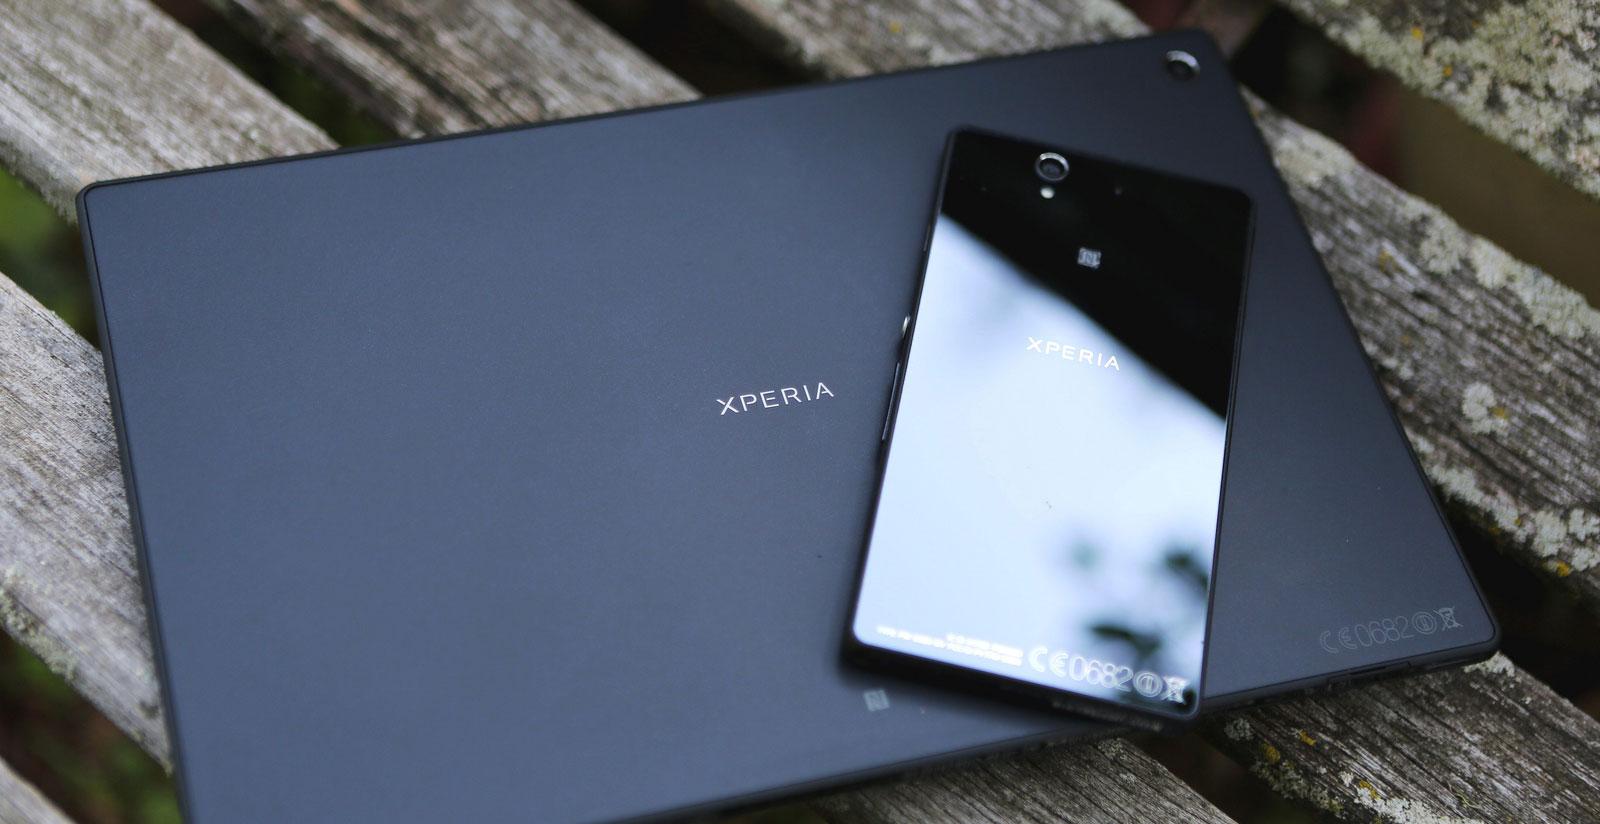 4 сентября Sony представит новый флагманский смартфон